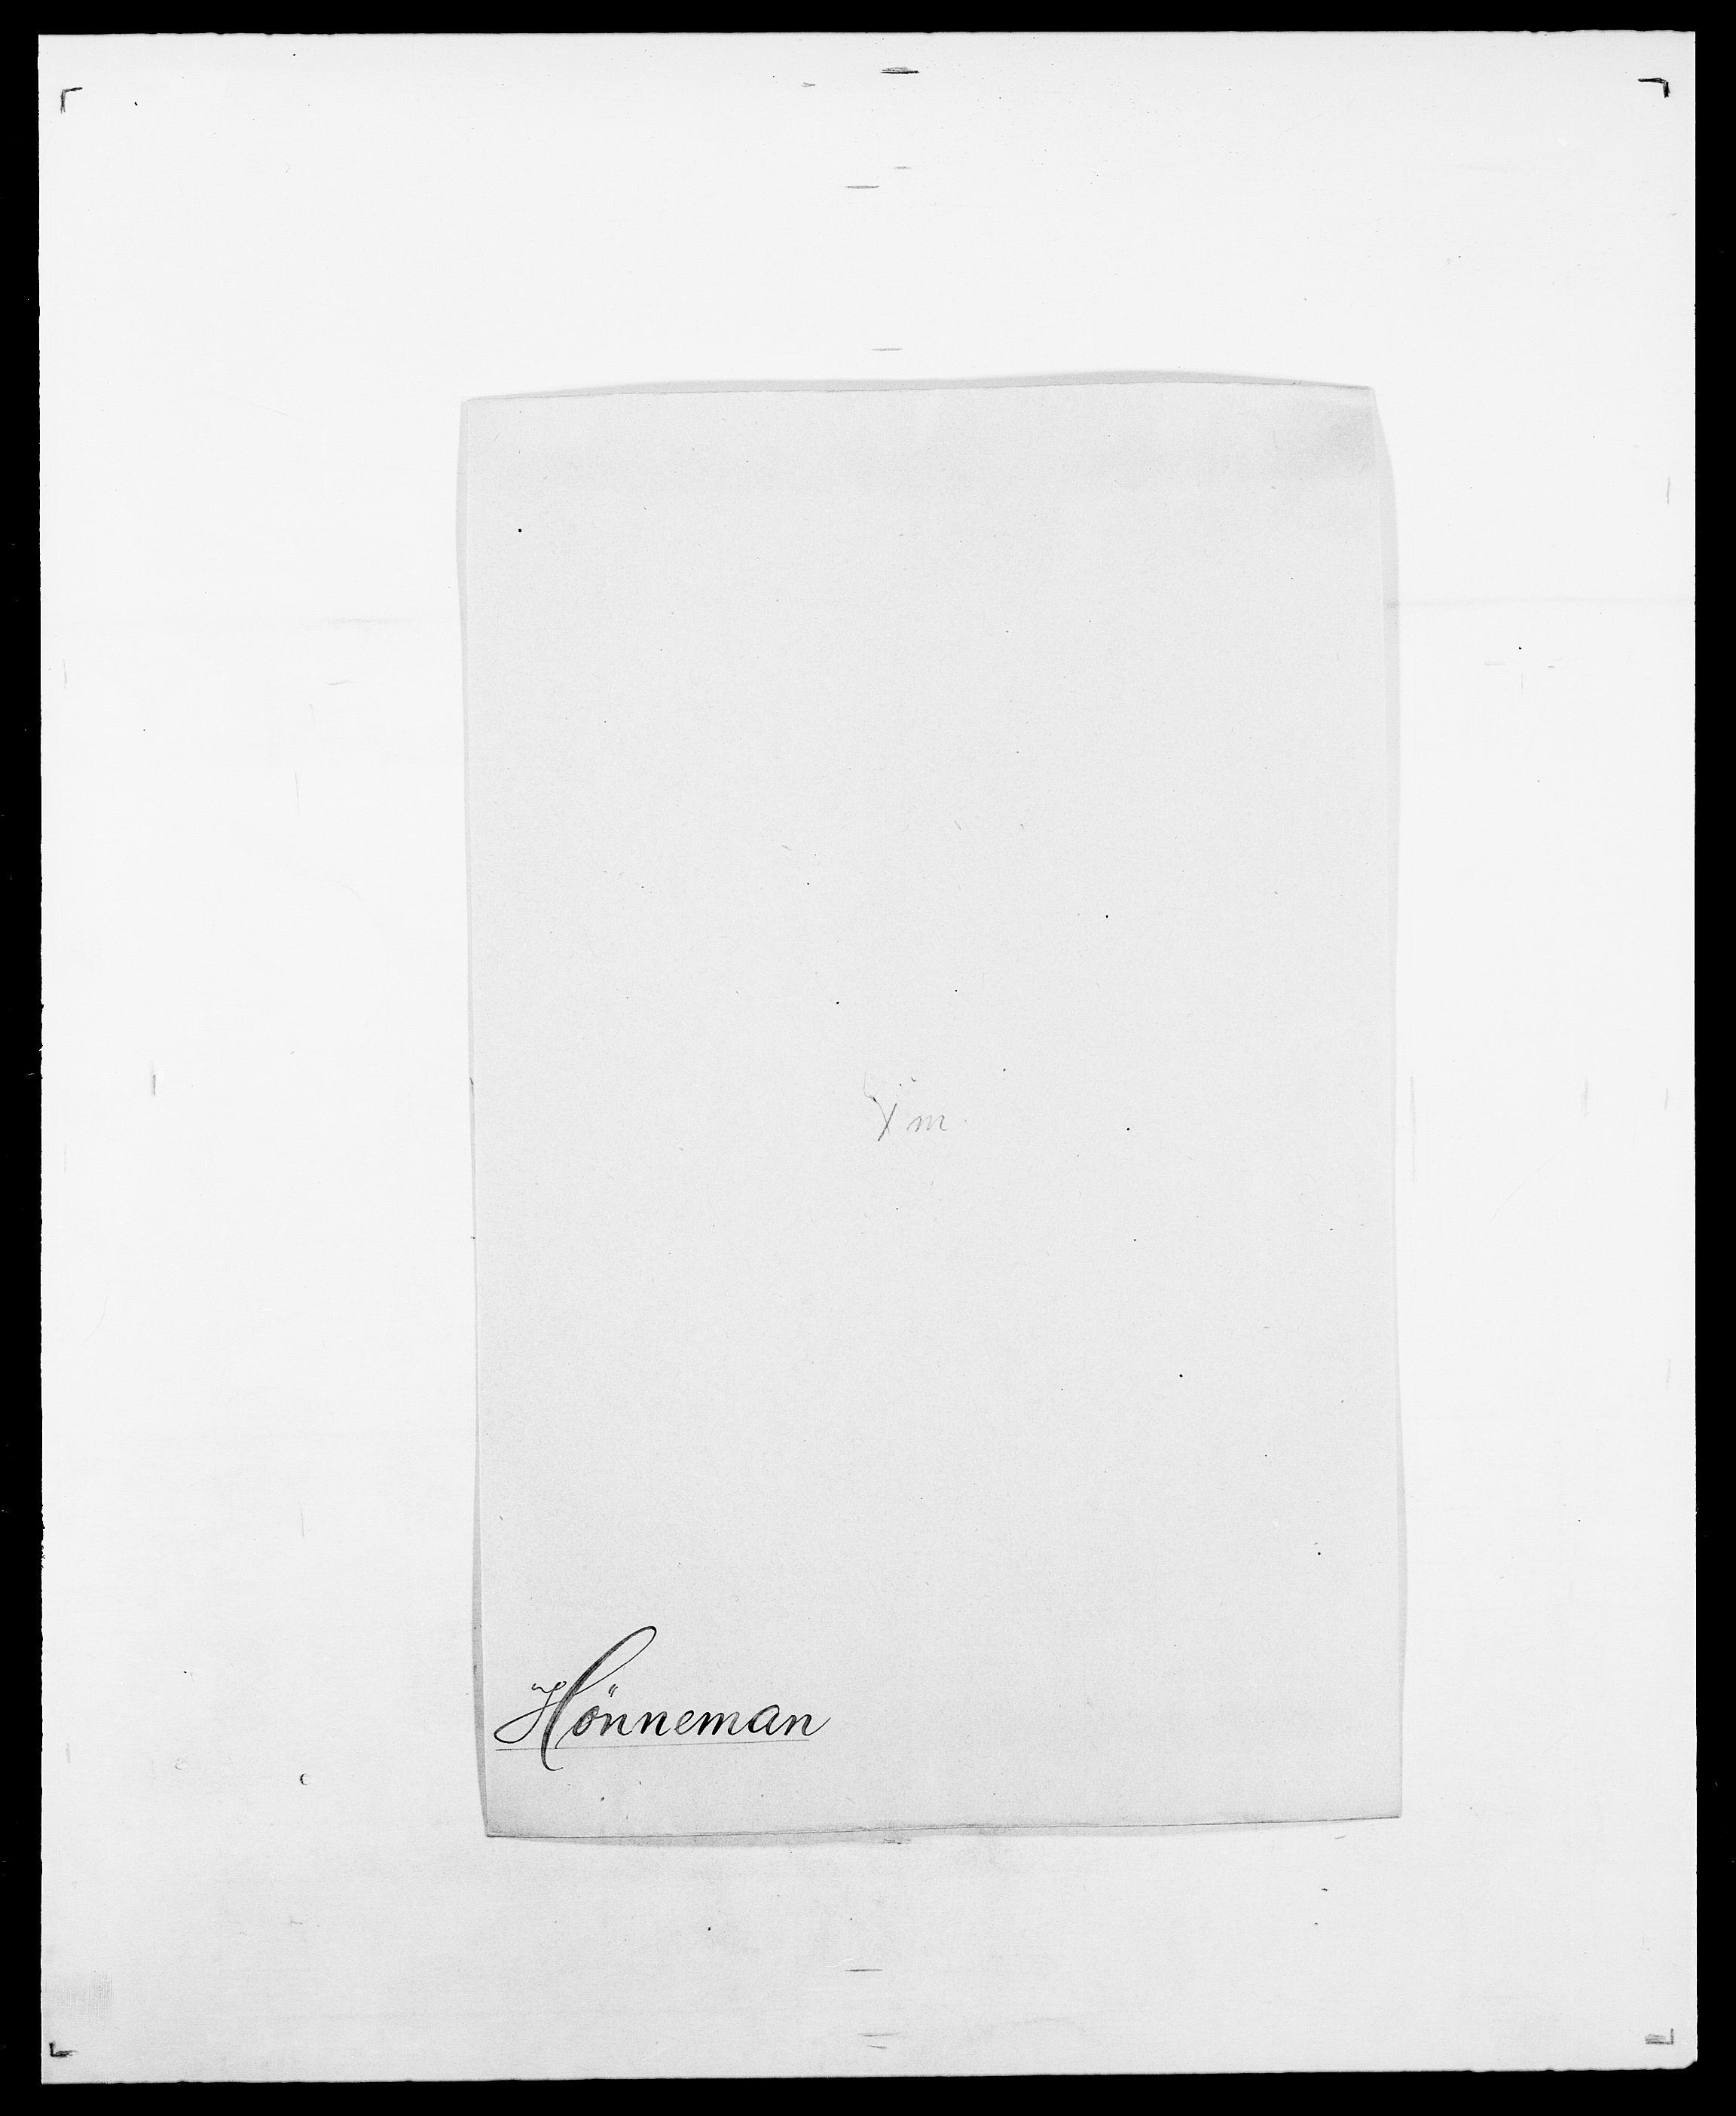 SAO, Delgobe, Charles Antoine - samling, D/Da/L0019: van der Hude - Joys, s. 369